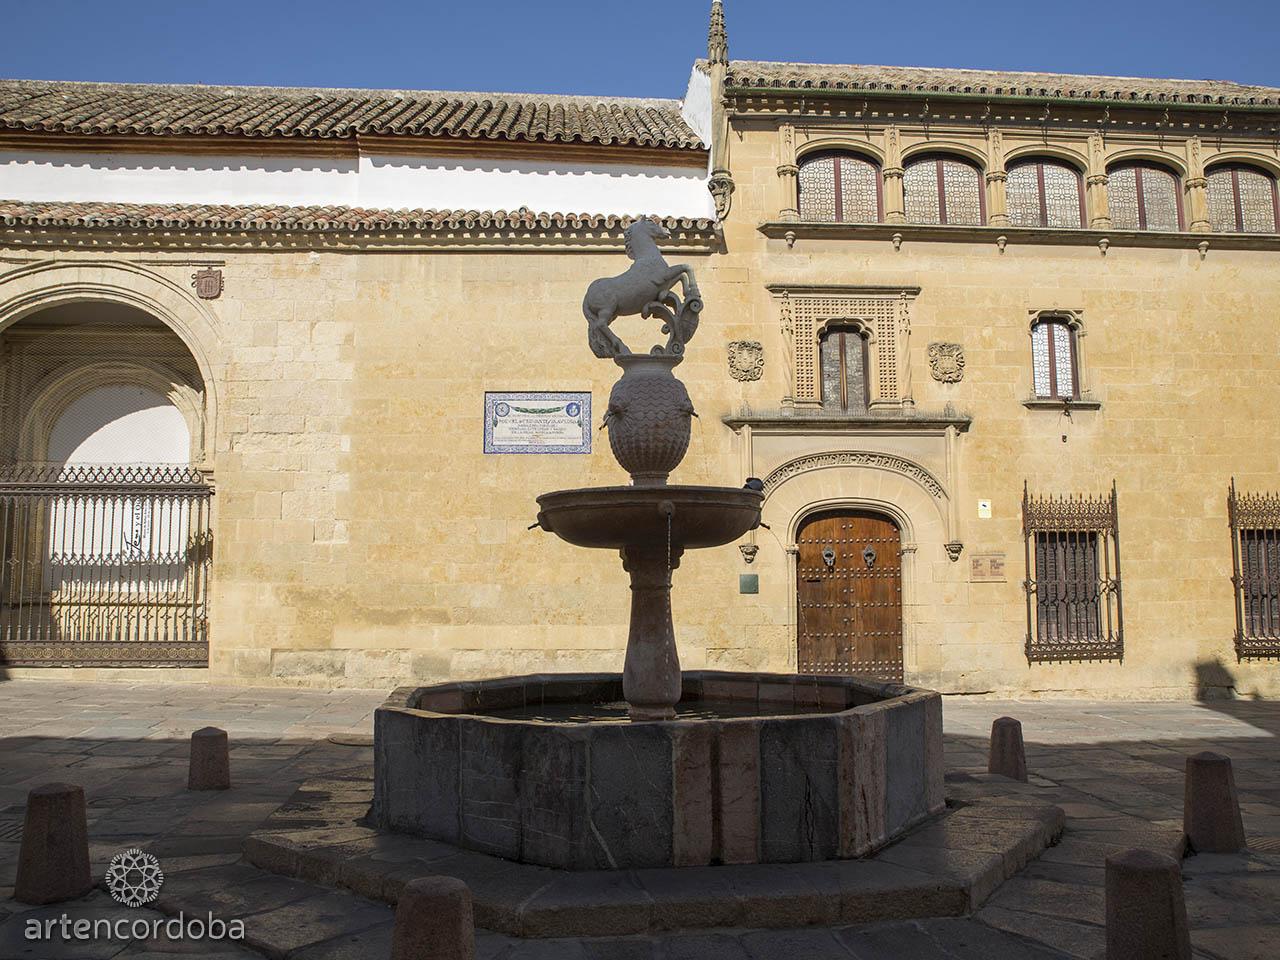 Plaza del Potro de Córdoba